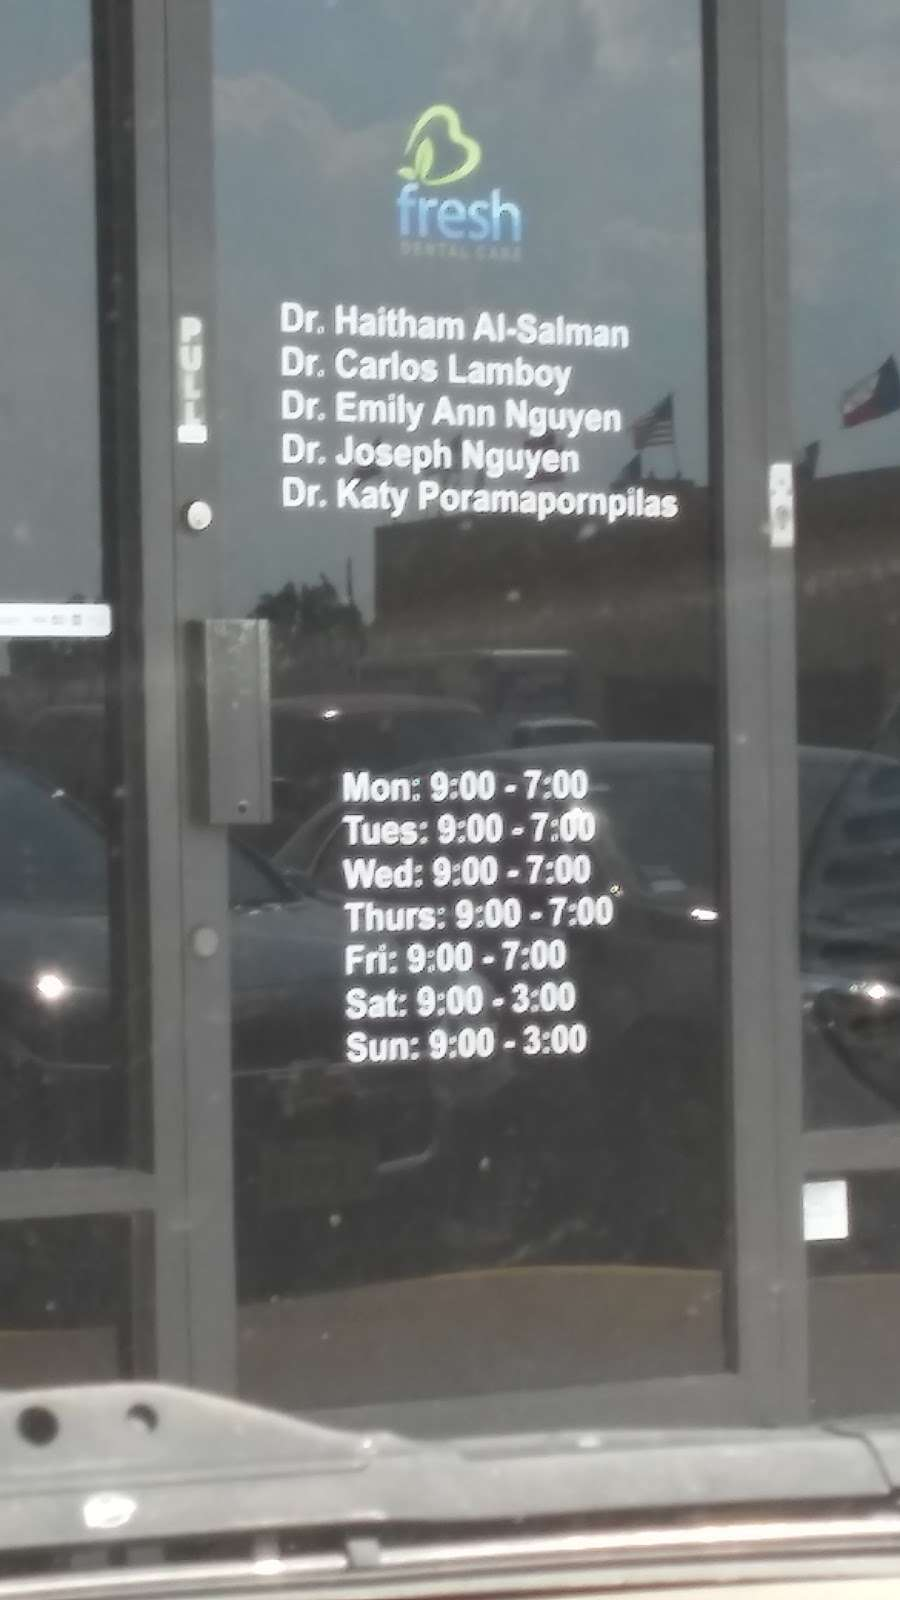 FRESH DENTAL CARE - 45 North - dentist  | Photo 9 of 9 | Address: 5900 North Fwy Suite #105, Houston, TX 77076, USA | Phone: (281) 771-1111